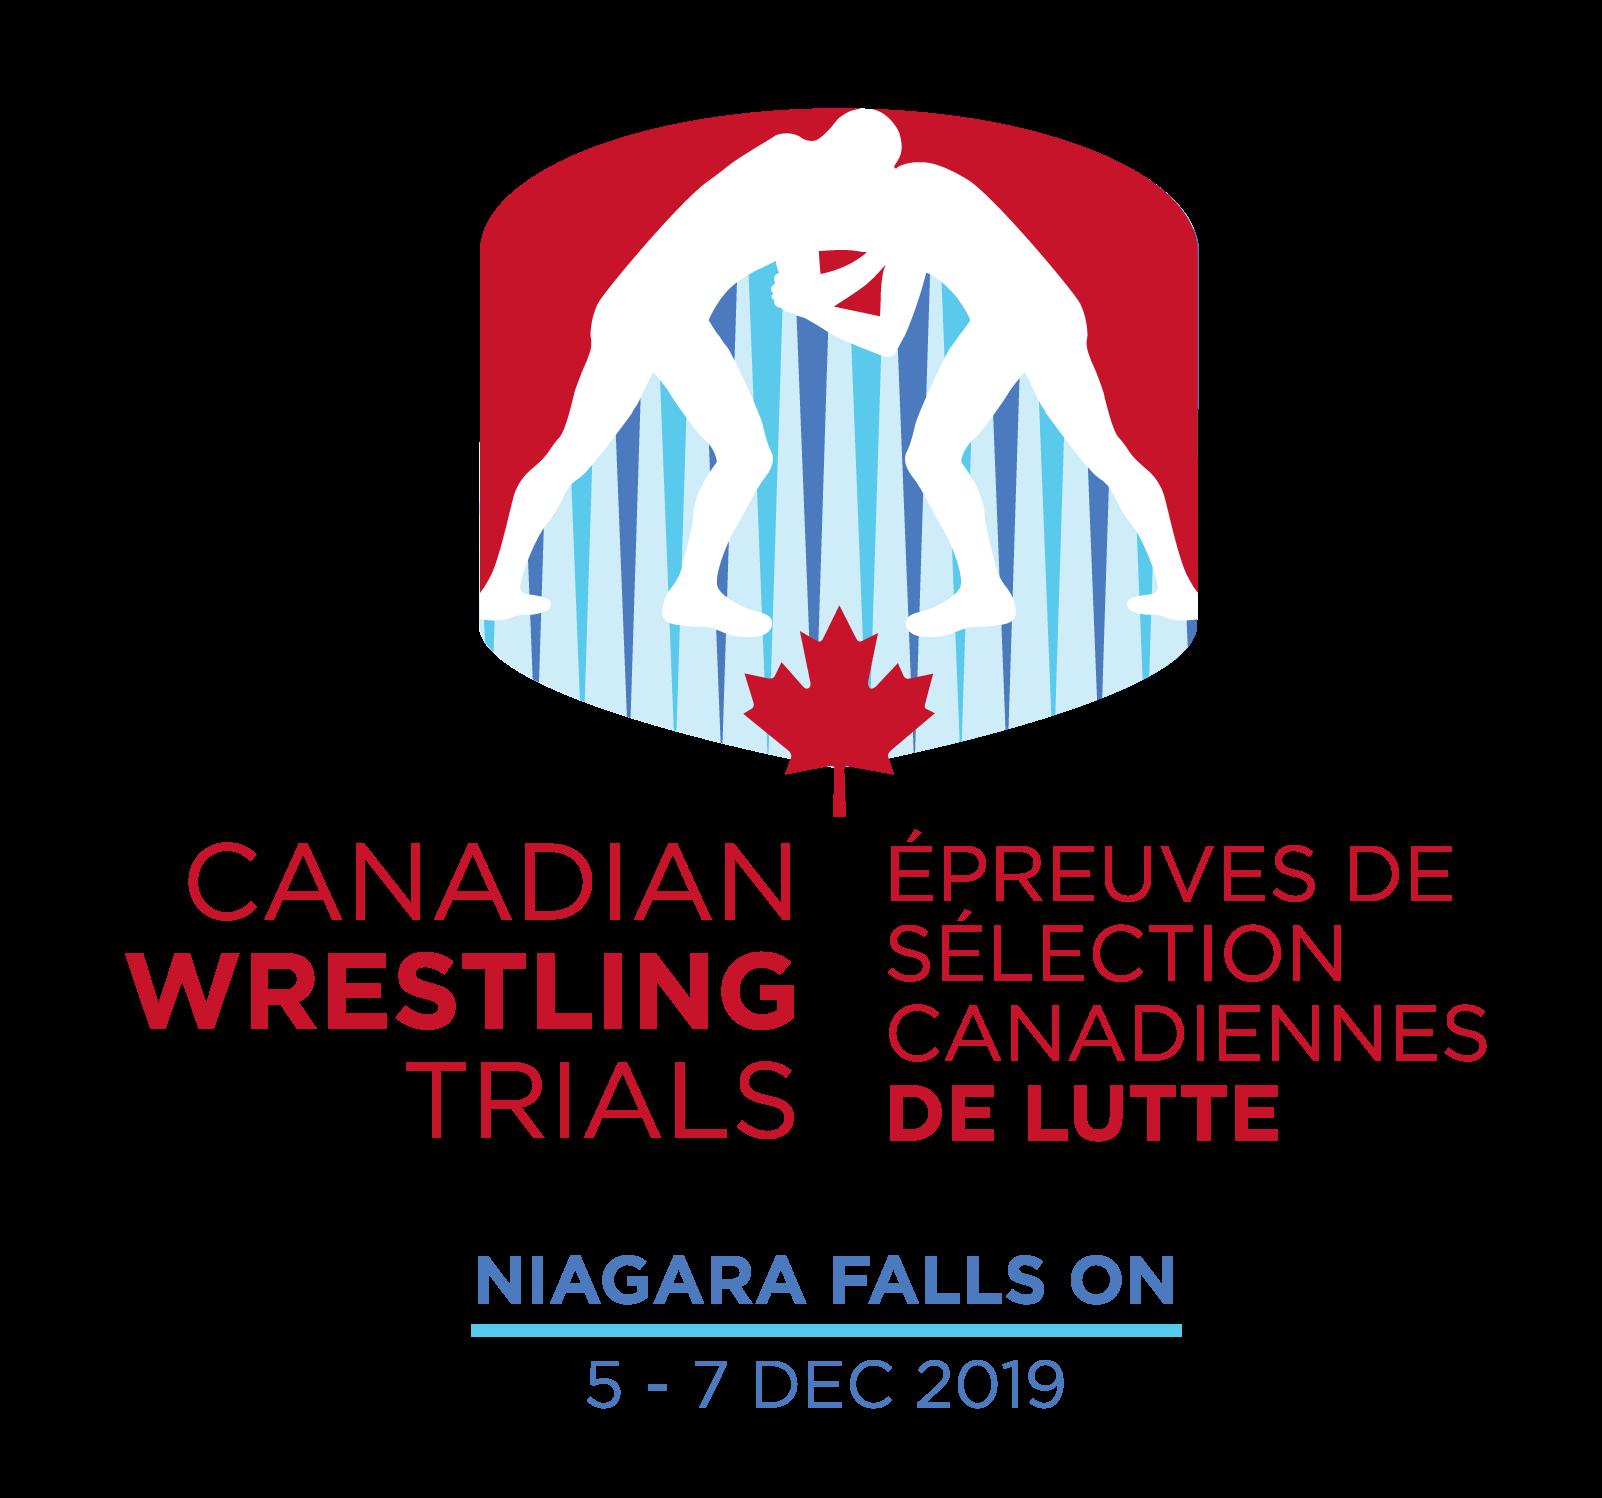 2019 Canadian Wrestling Trials - SUPPORT STAFF REGISTRATION